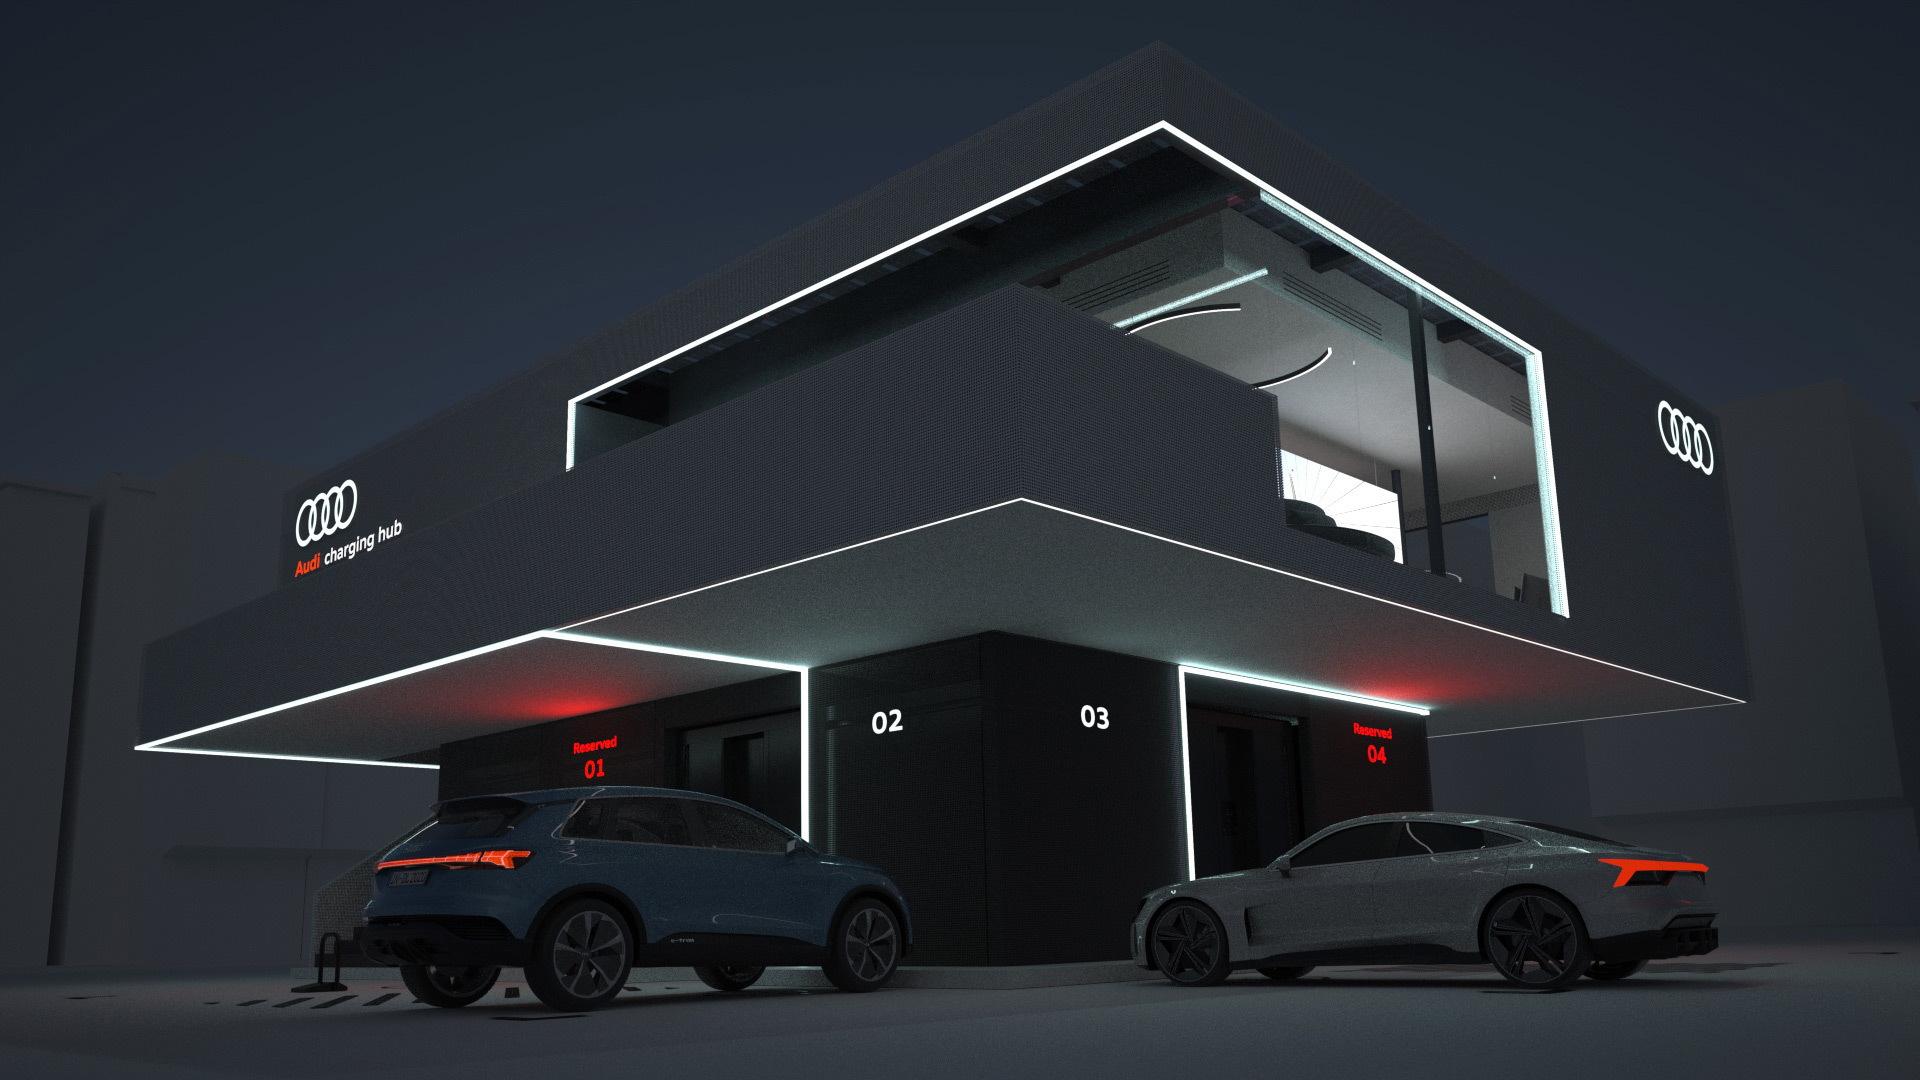 Artist's impression of Audi charging station